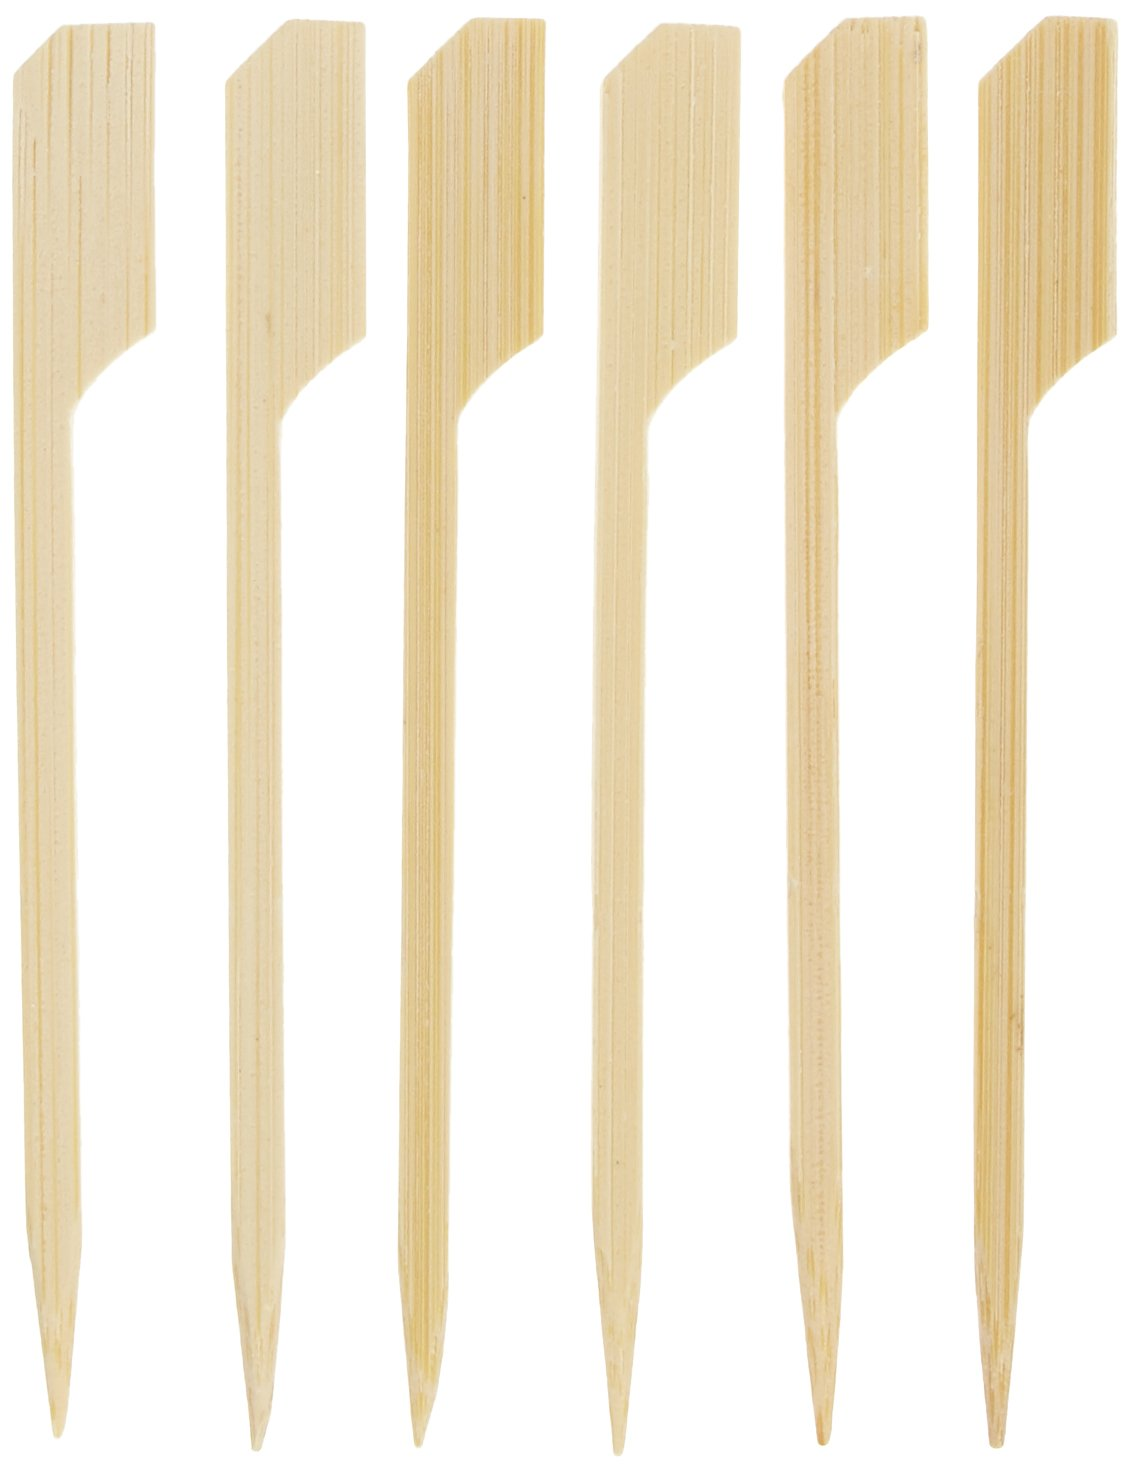 90 mm 100 St/ück in Spenderbox Finger-skewers Bambus IMS Party 302682 Spie/ße